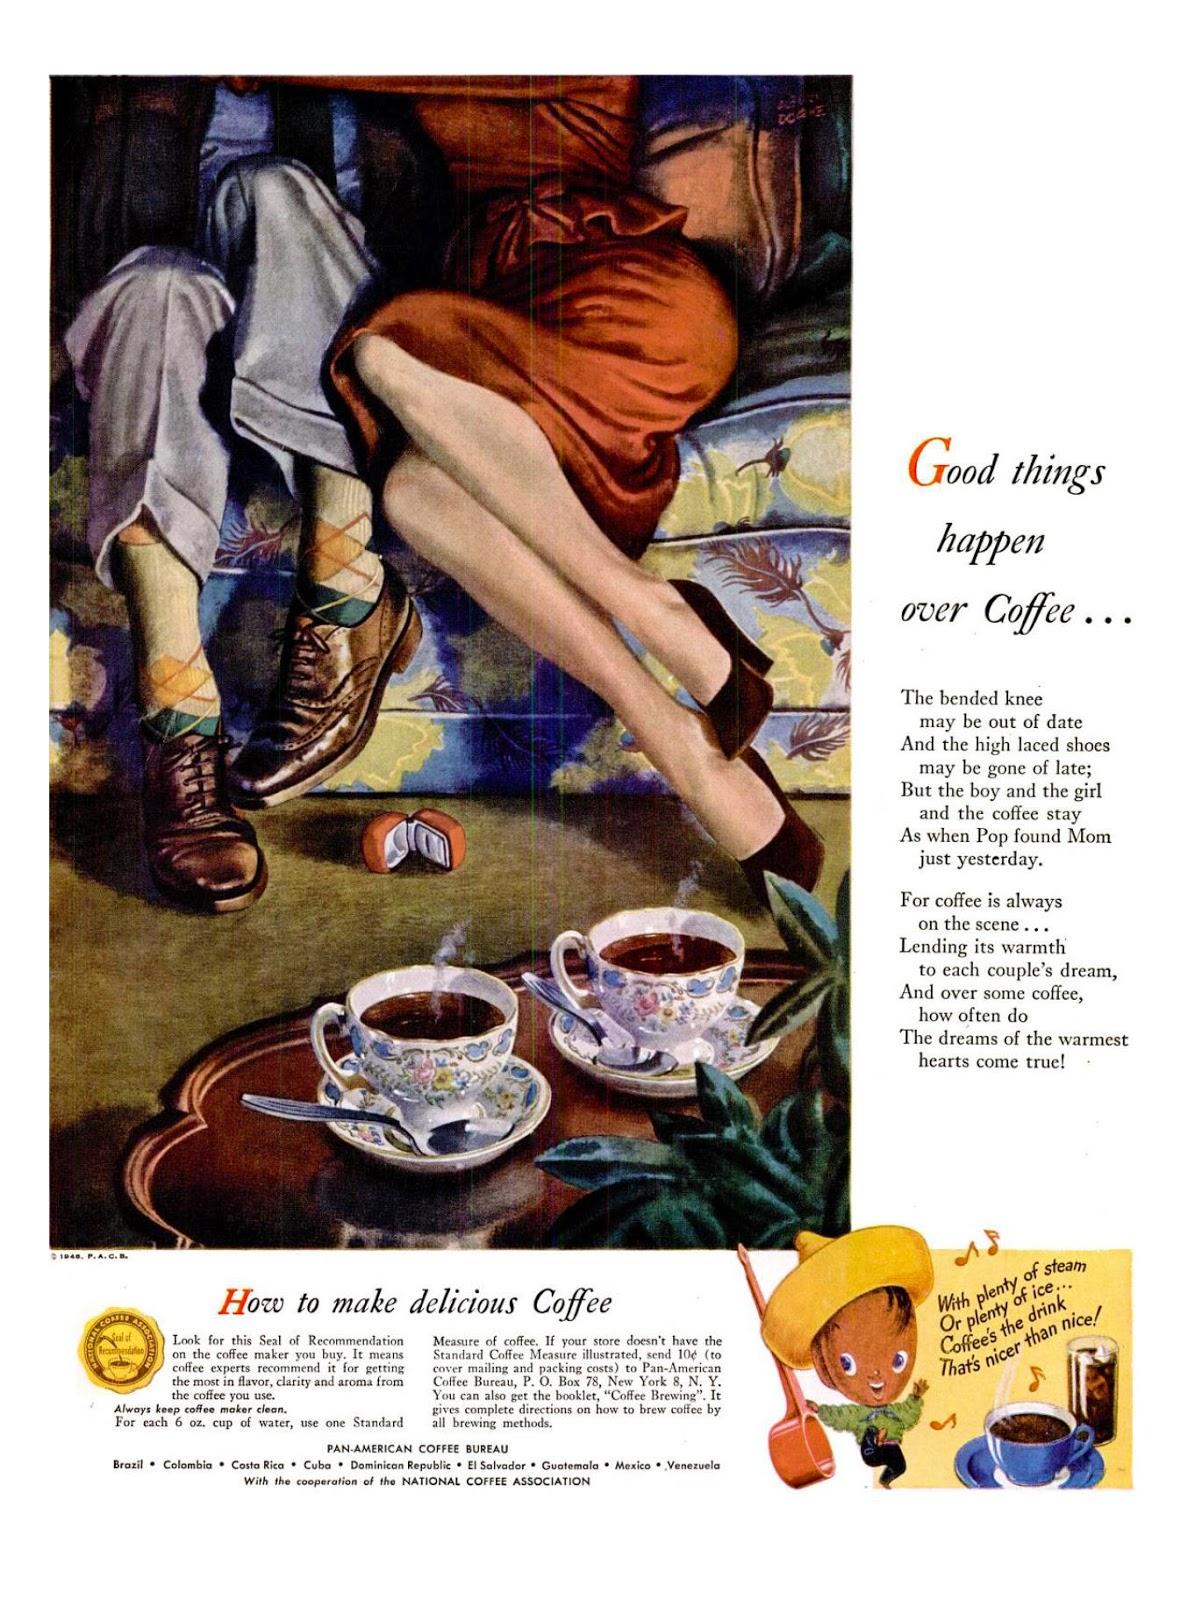 1948-1 Pan-American Coffee Bureau LIFE Jan 12, 1948 ~ Albert Dorne.jpeg